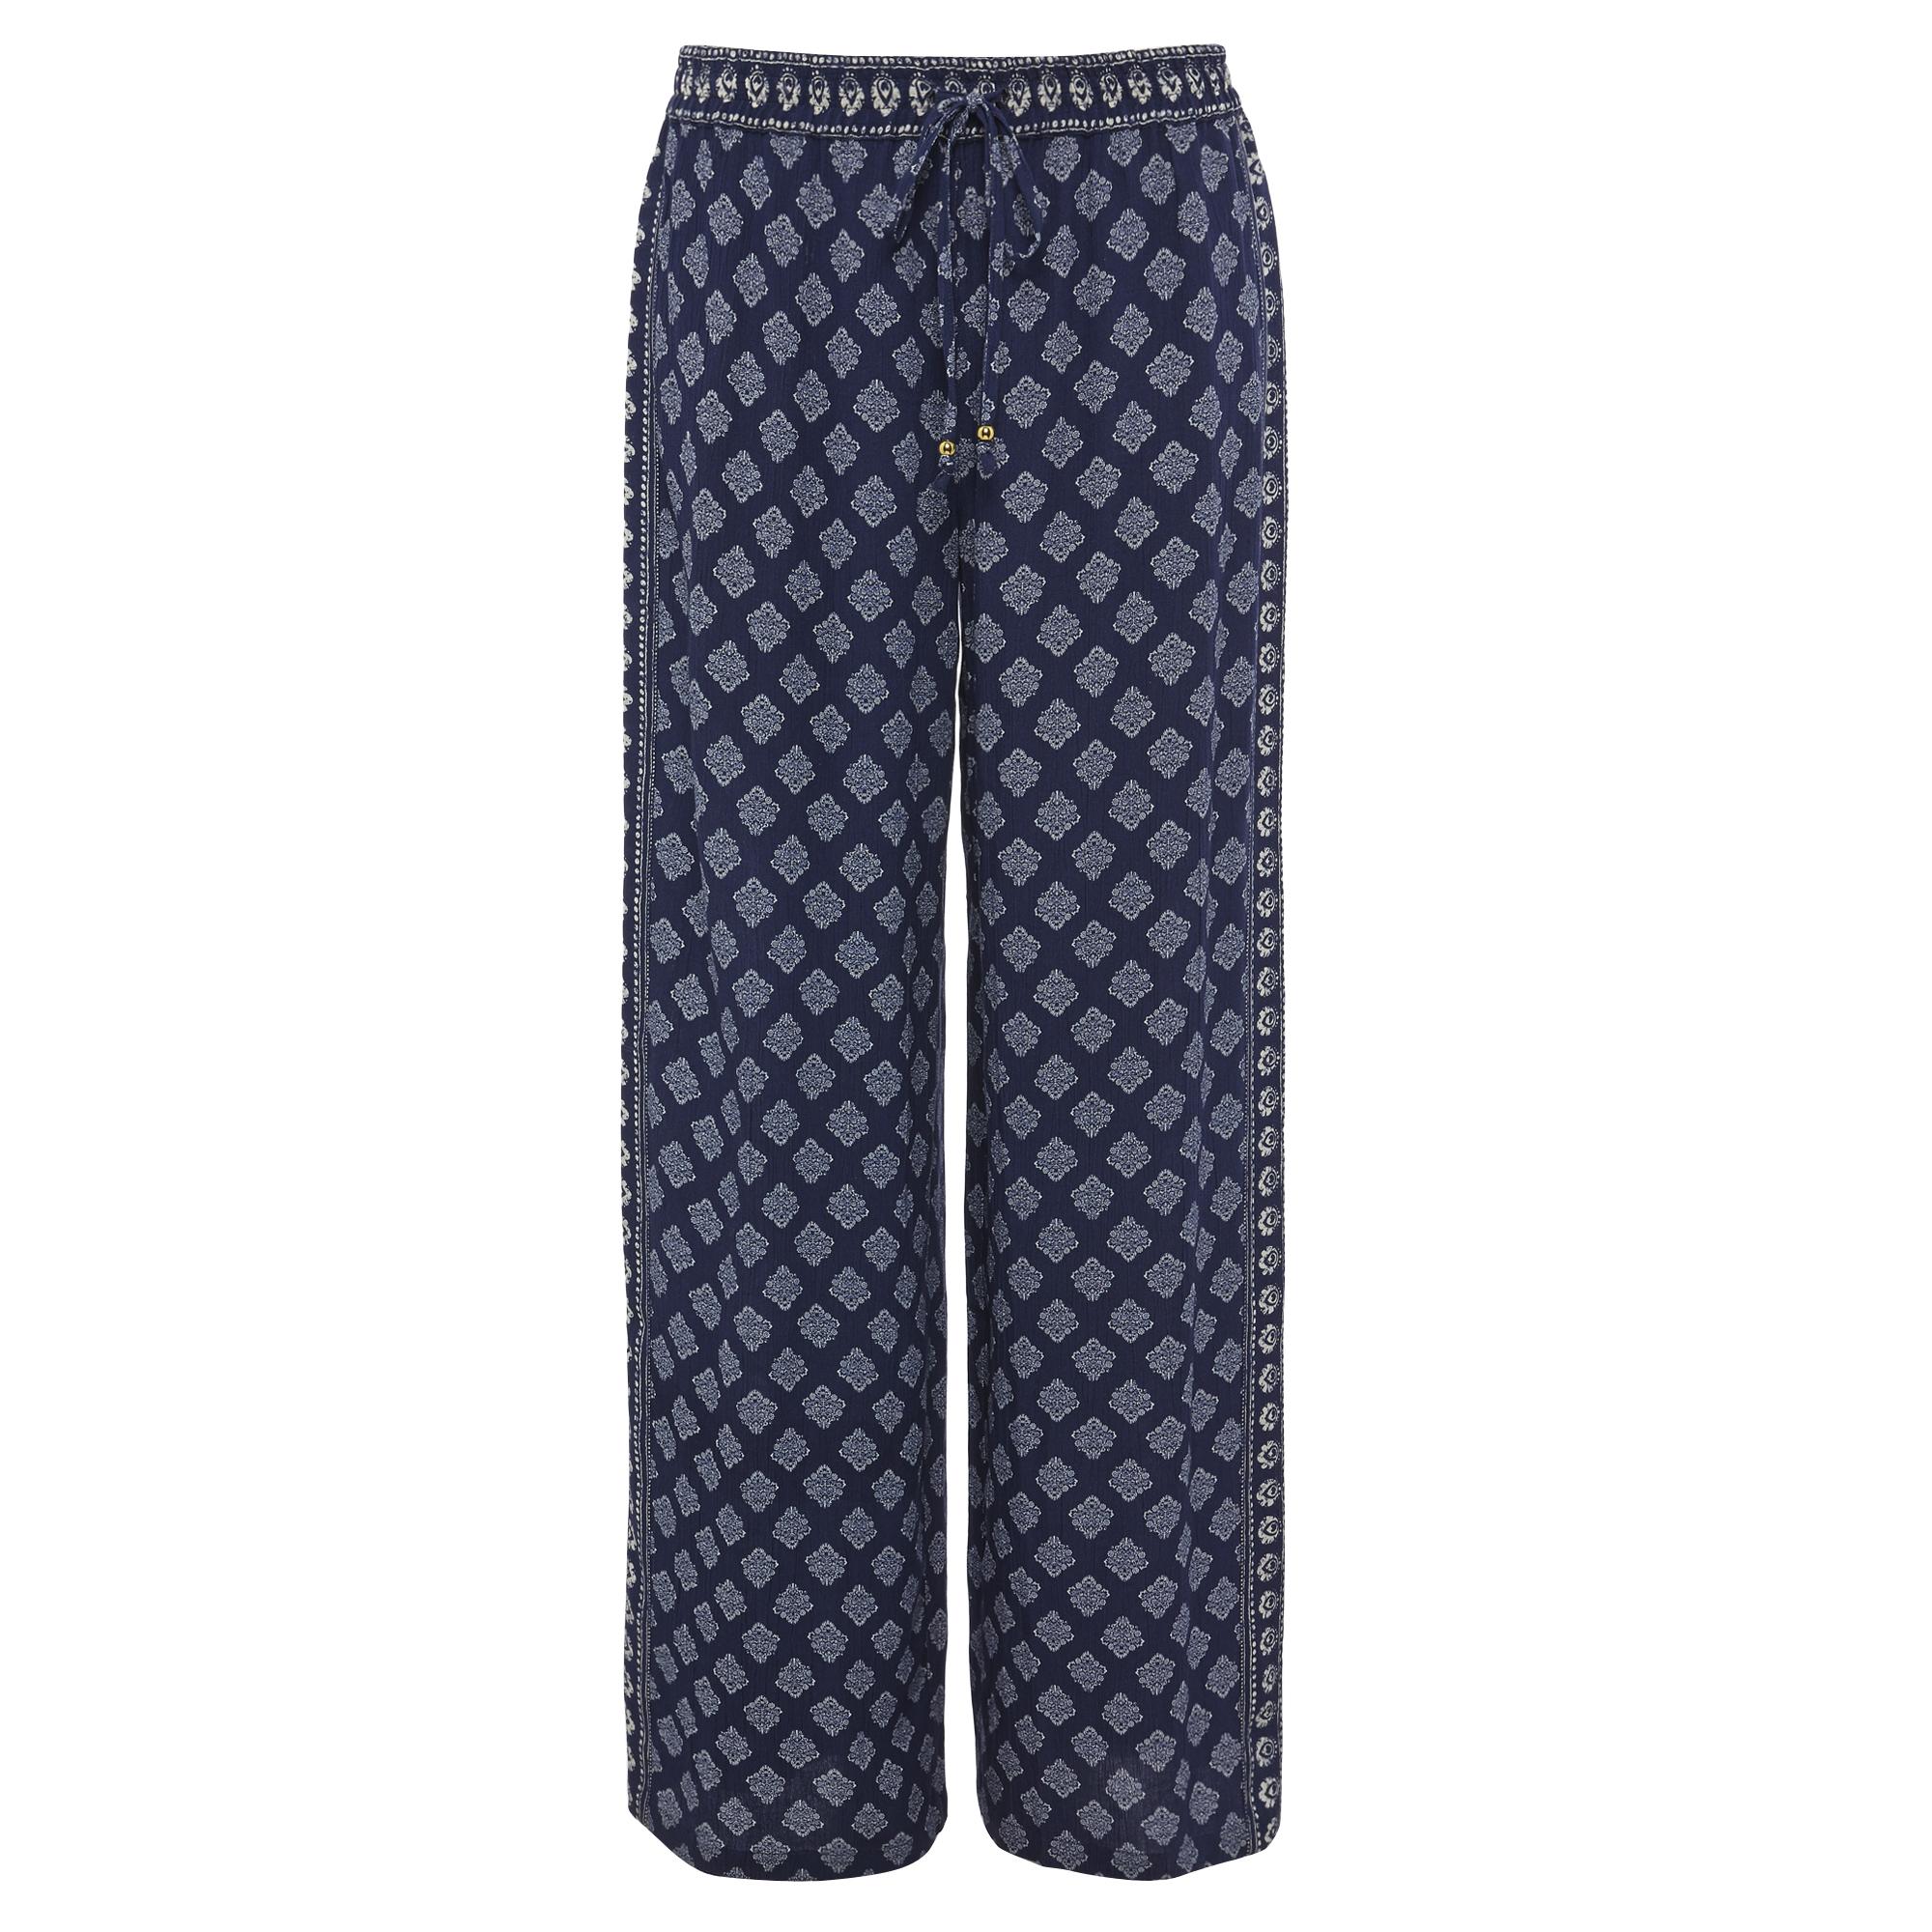 Wide legged pants Dhs95